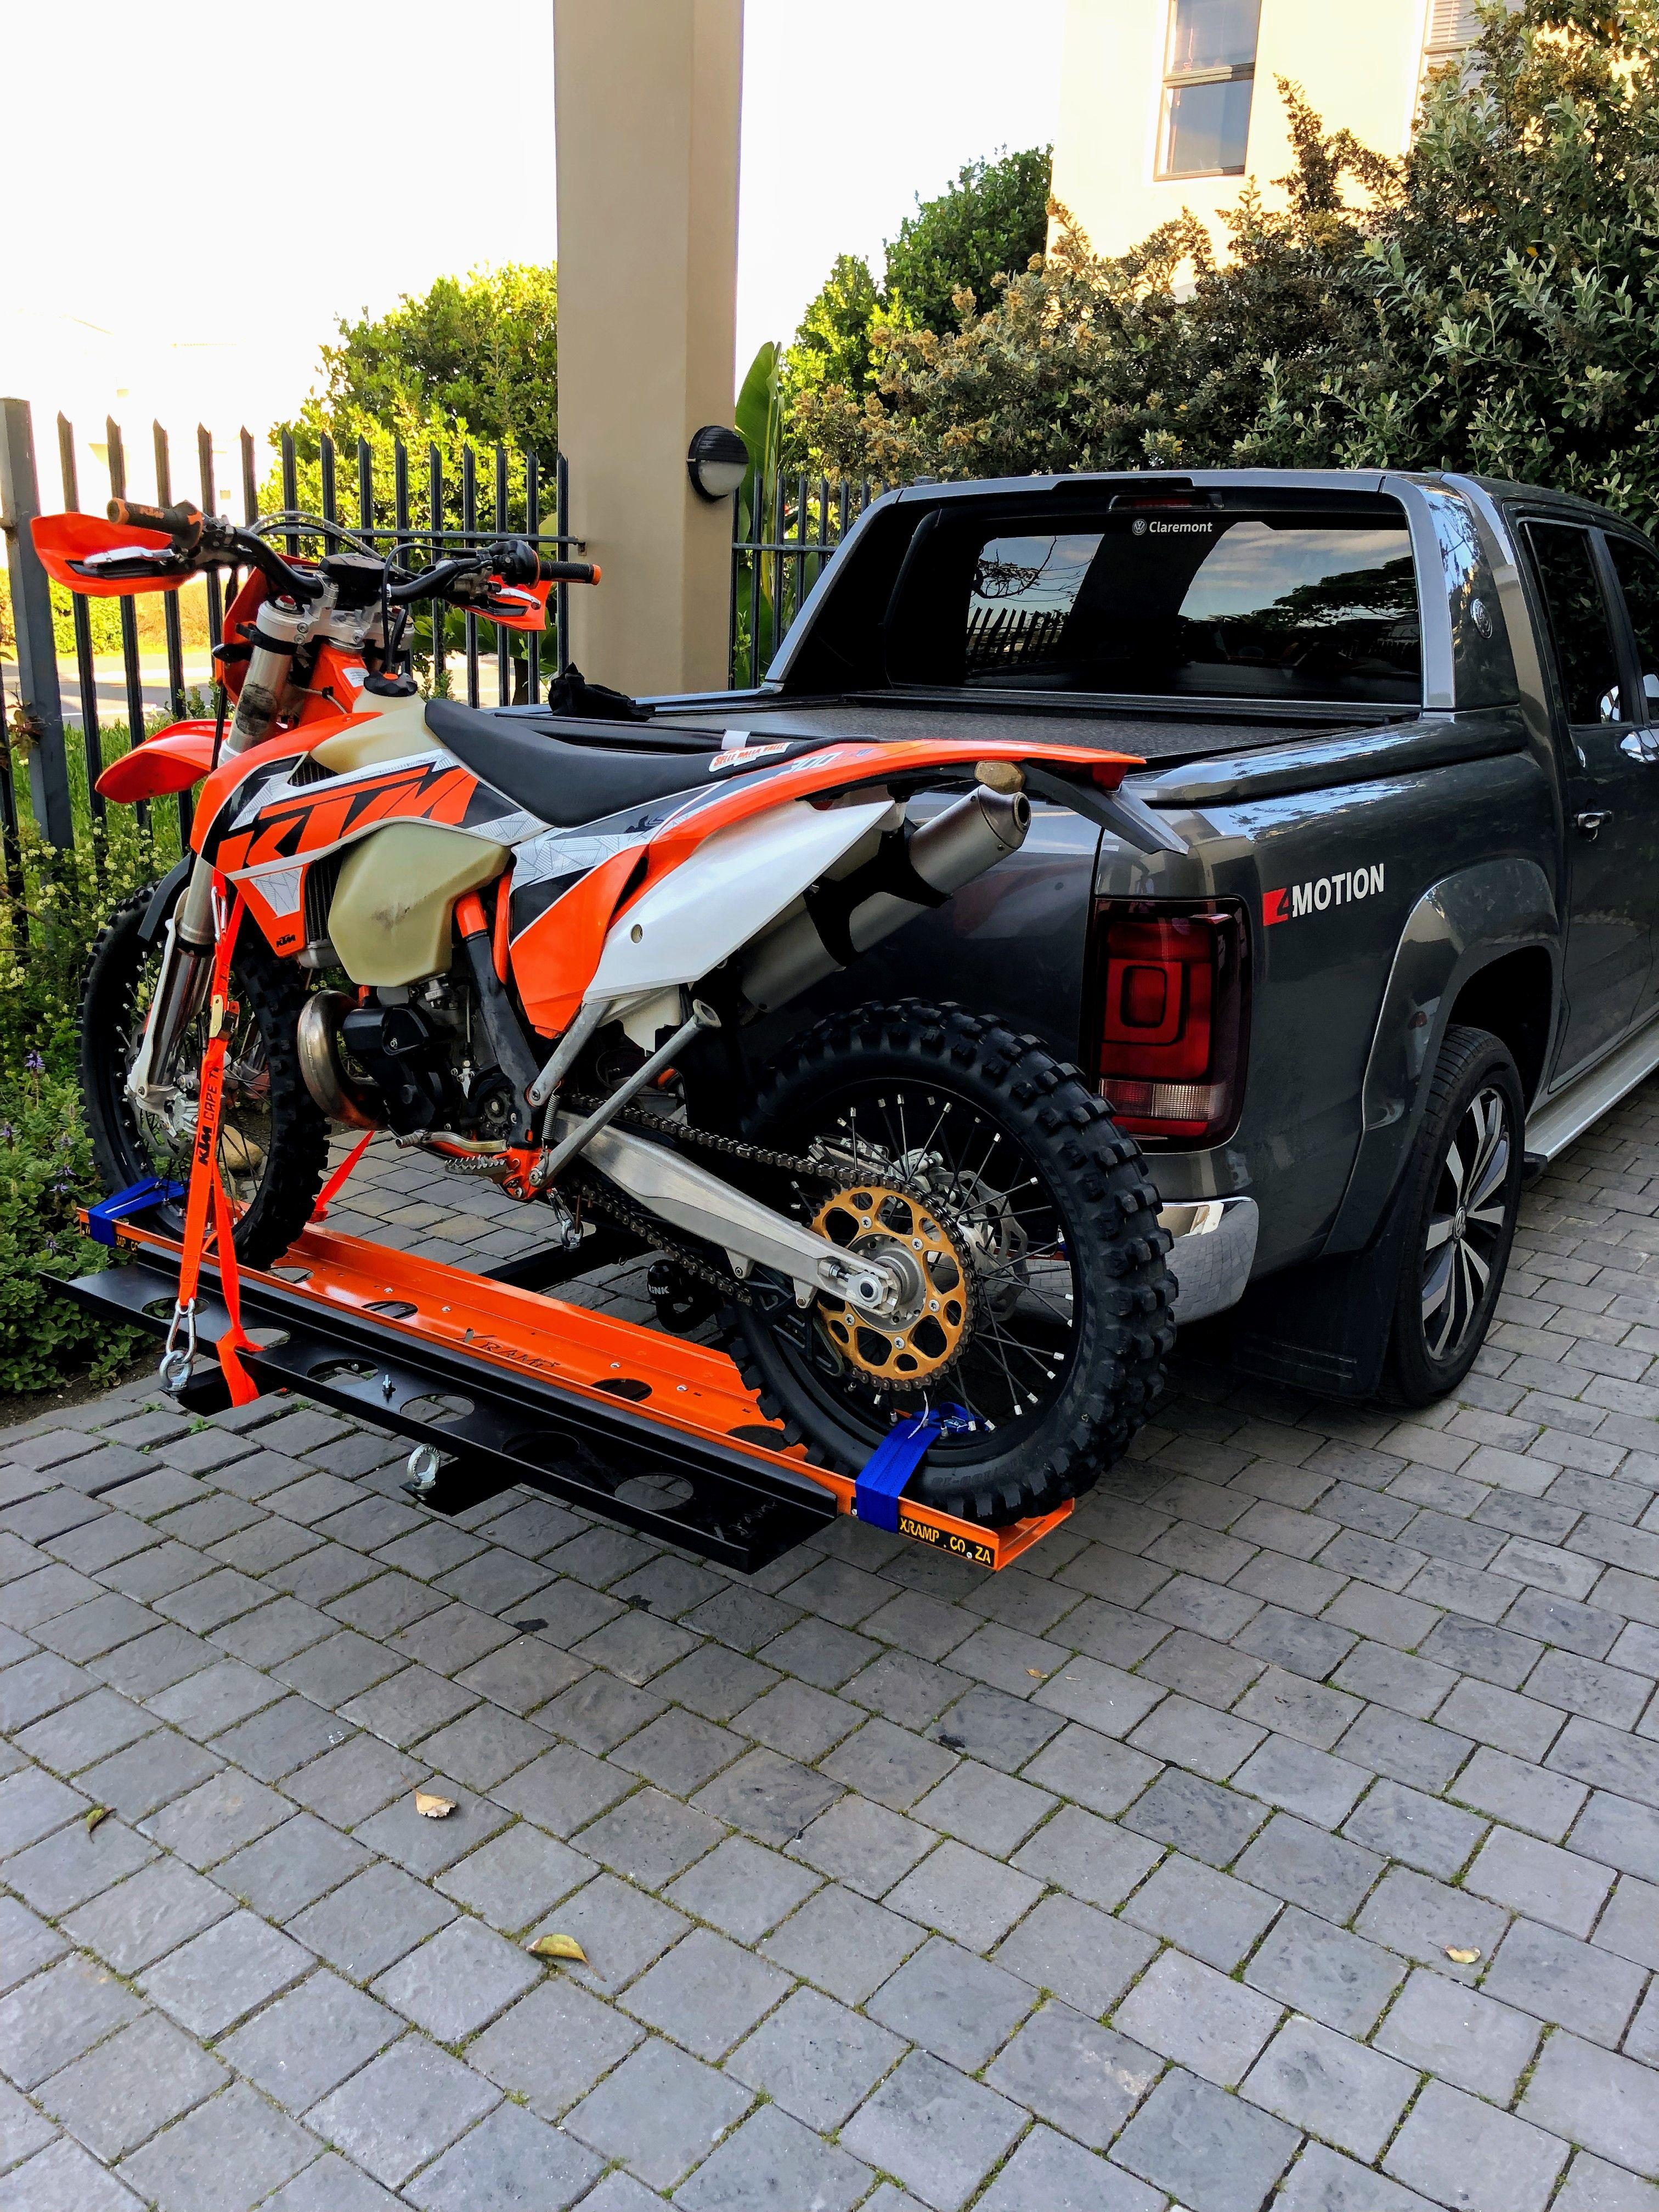 X Ramp Fitted To My Truck Works Well Trucks Monster Trucks Wellness